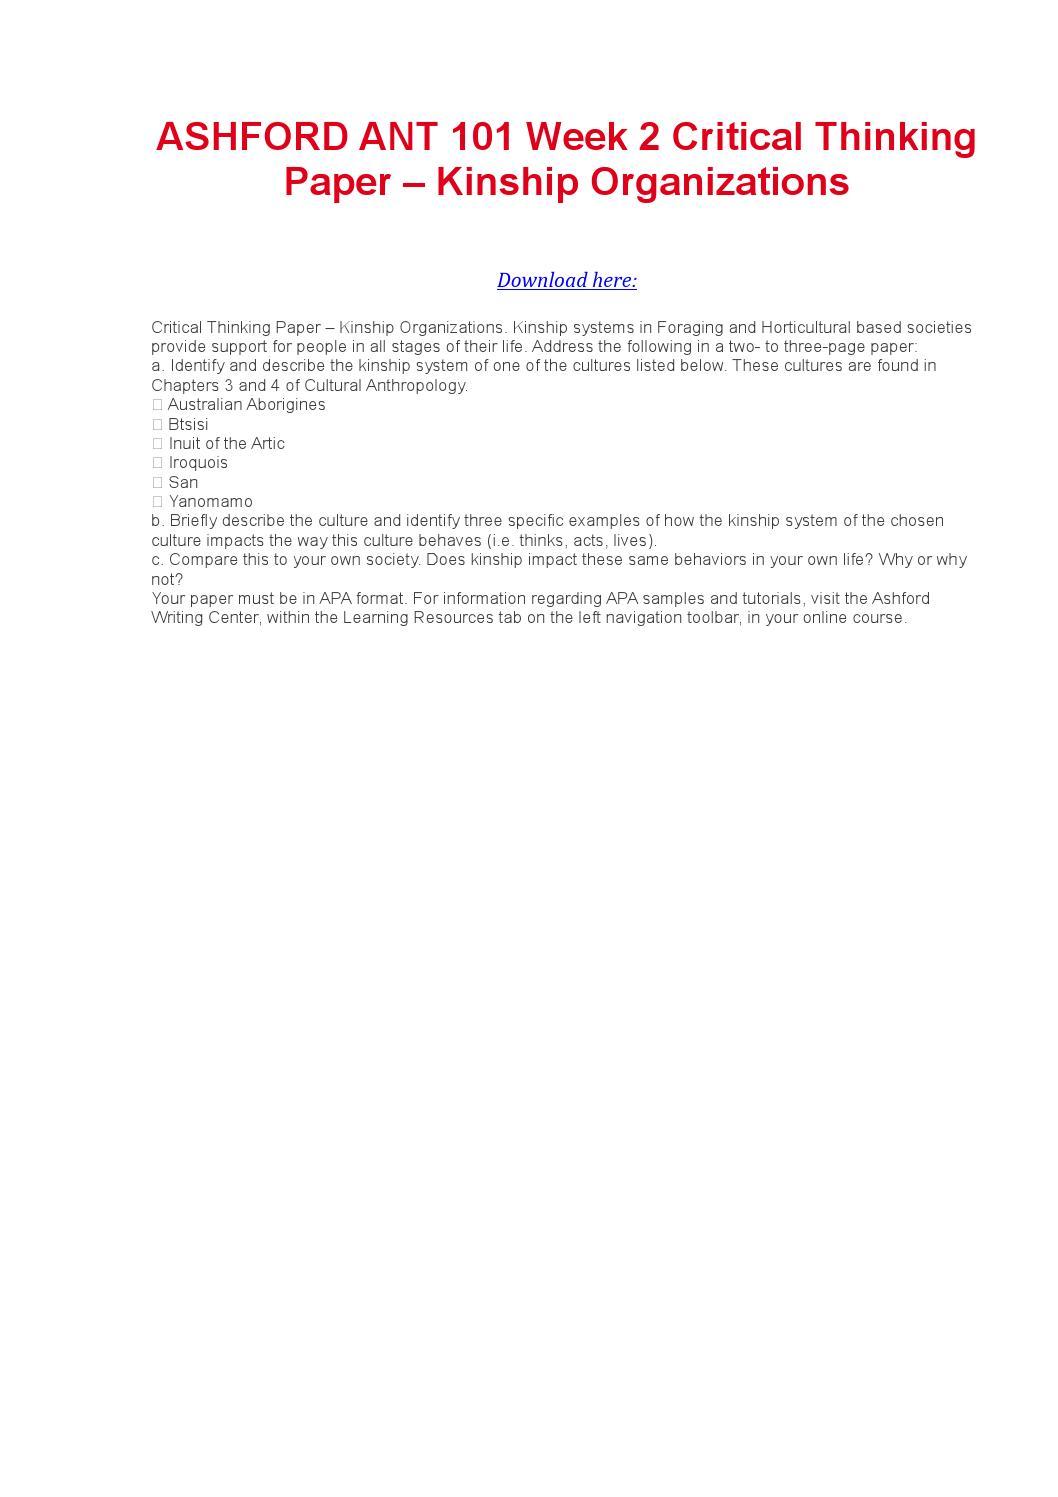 Critical thinking application paper kinship organizations